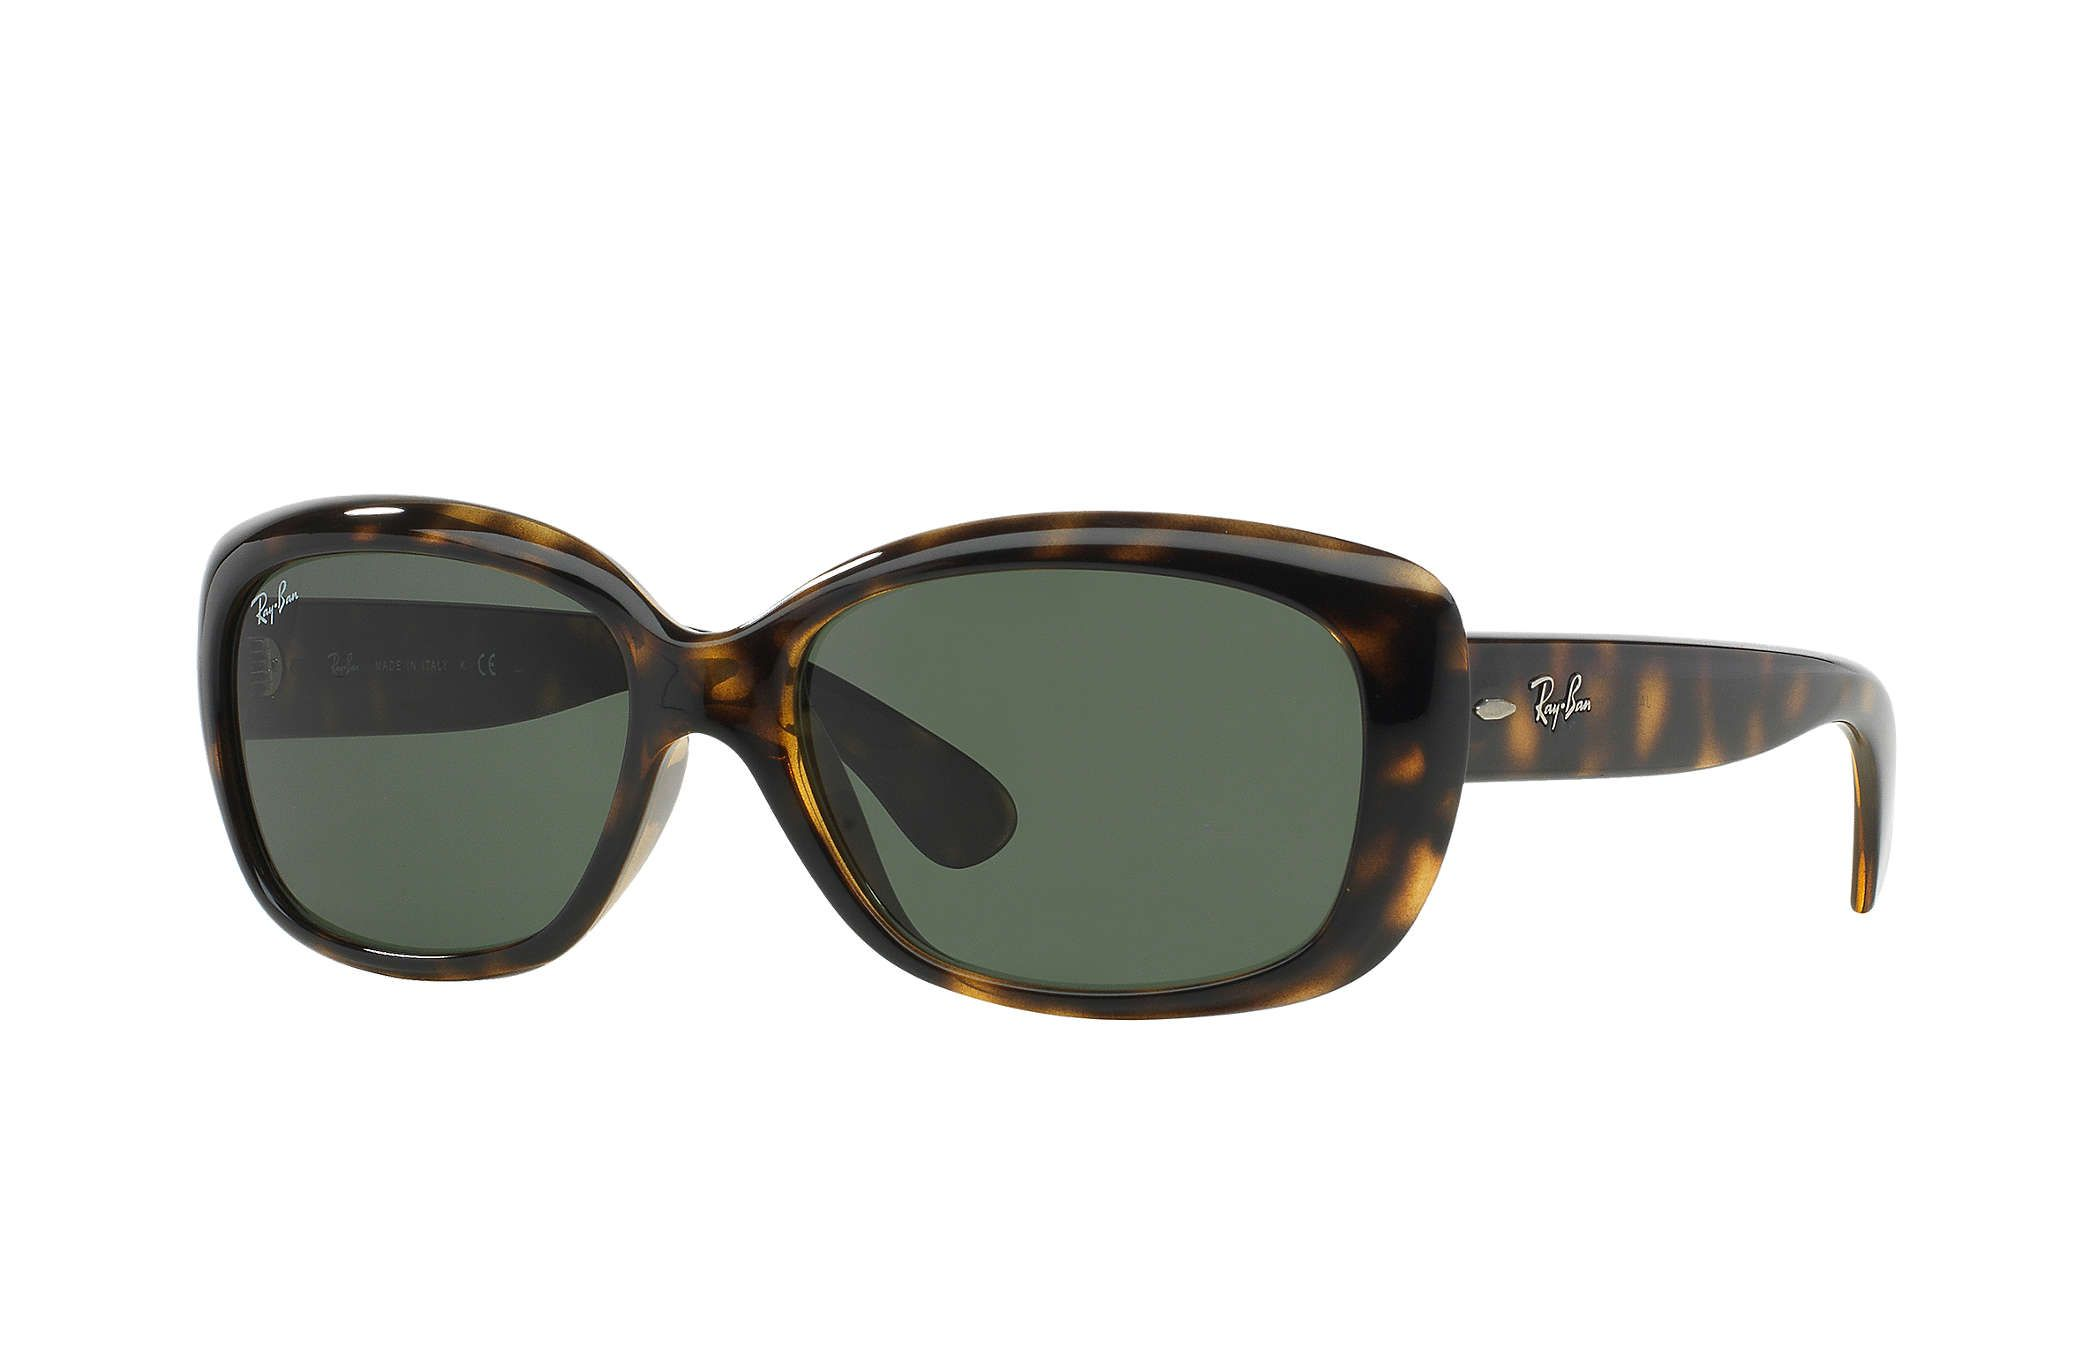 Ray Ban 0rb4101 Jackie Ohh Tortoise Sun Rectangle Sunglasses Ray Ban Women Ray Bans